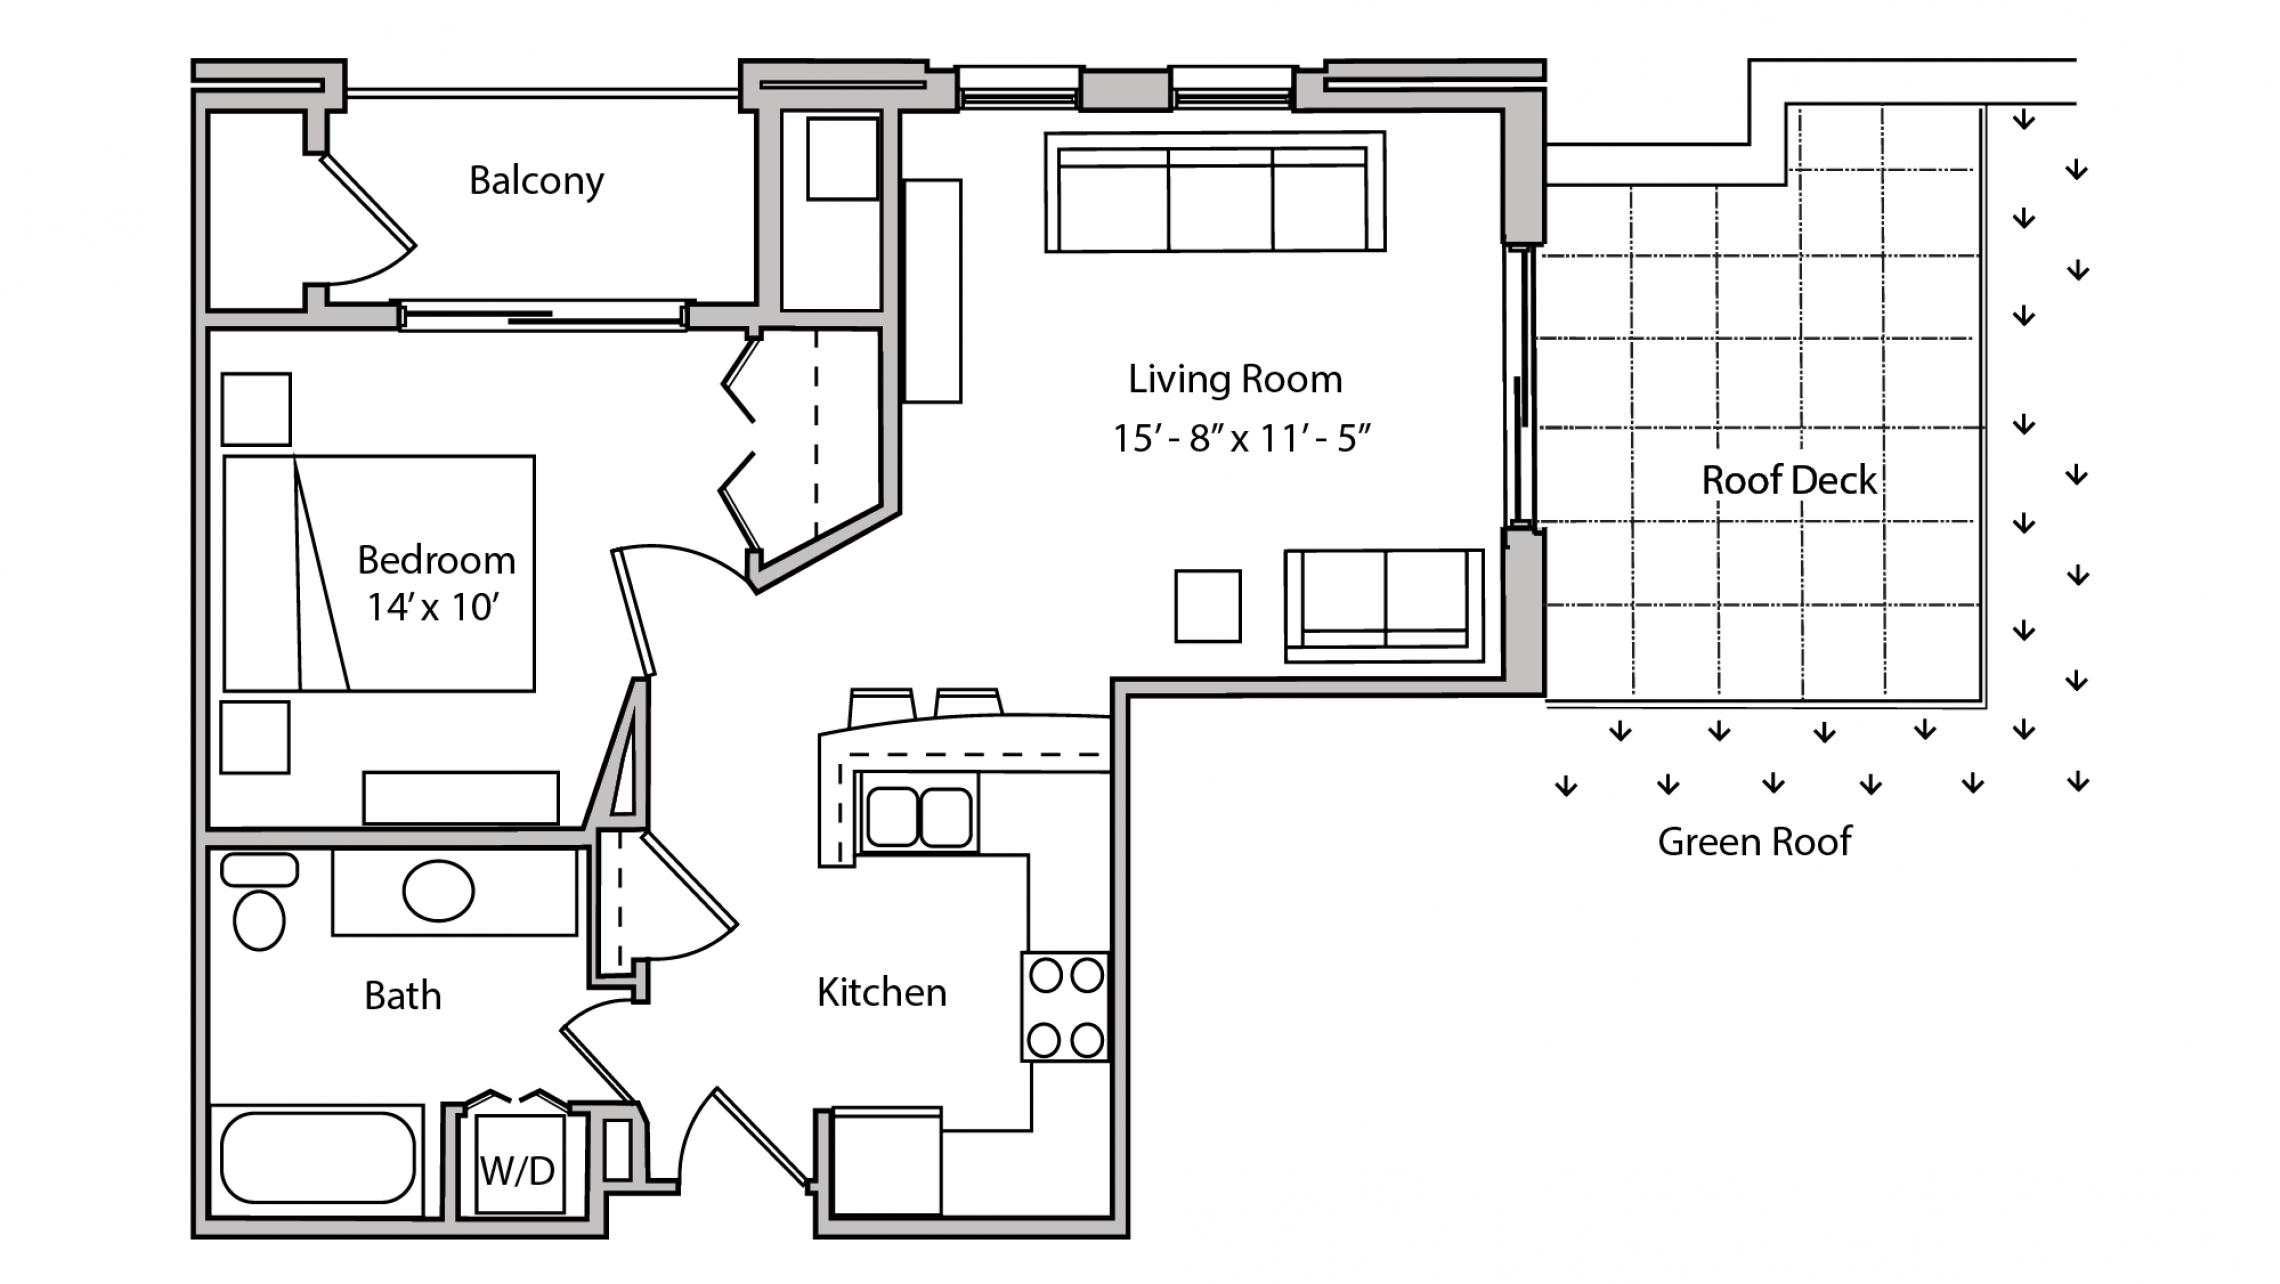 ULI The Depot 2-409 - One Bedroom, One Bathroom